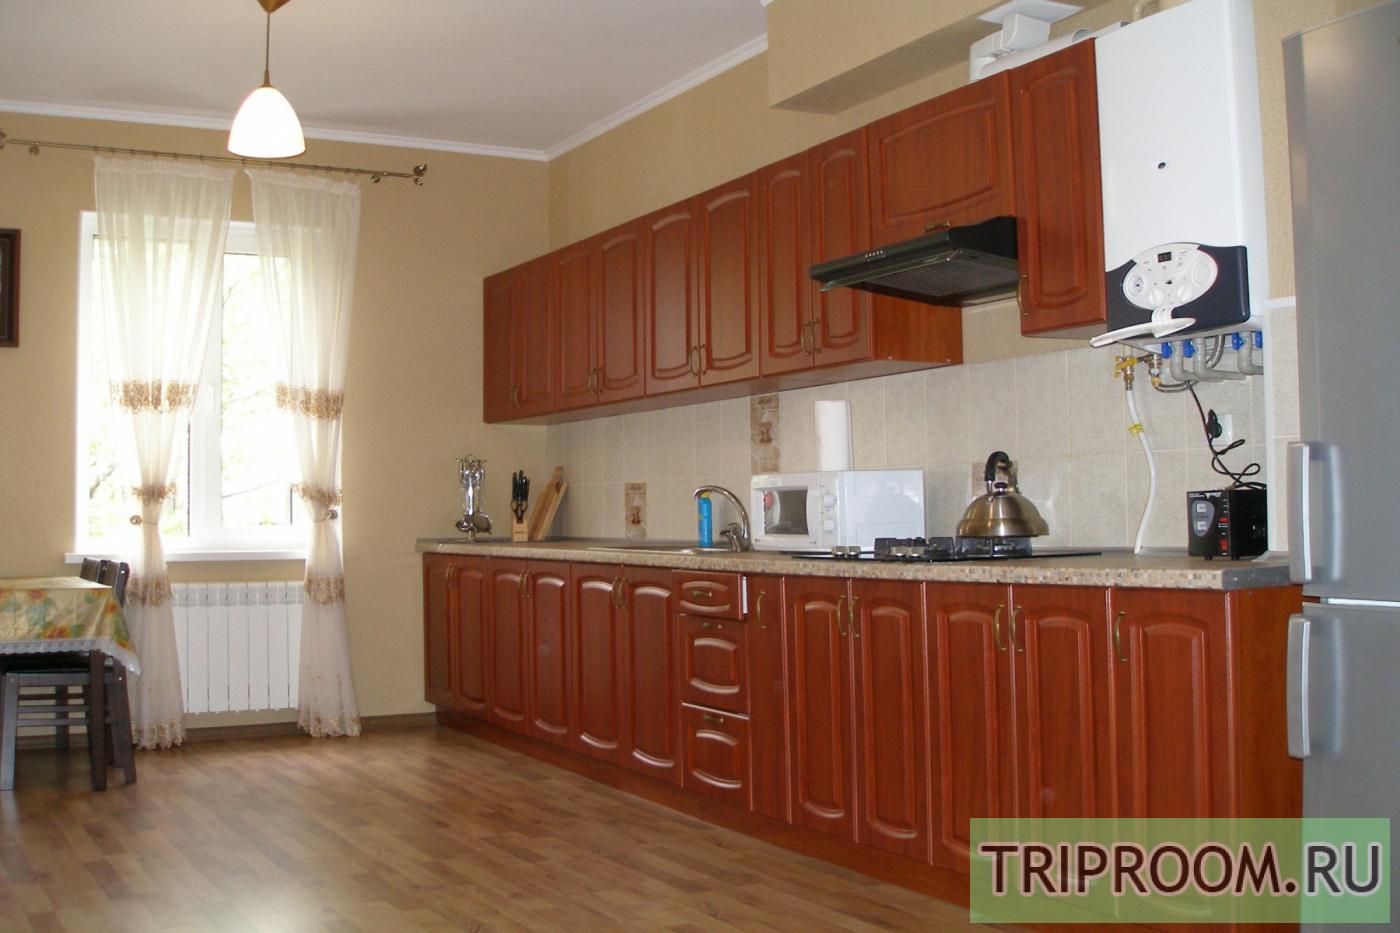 3-комнатная квартира посуточно (вариант № 34537), ул. Чехова улица, фото № 1